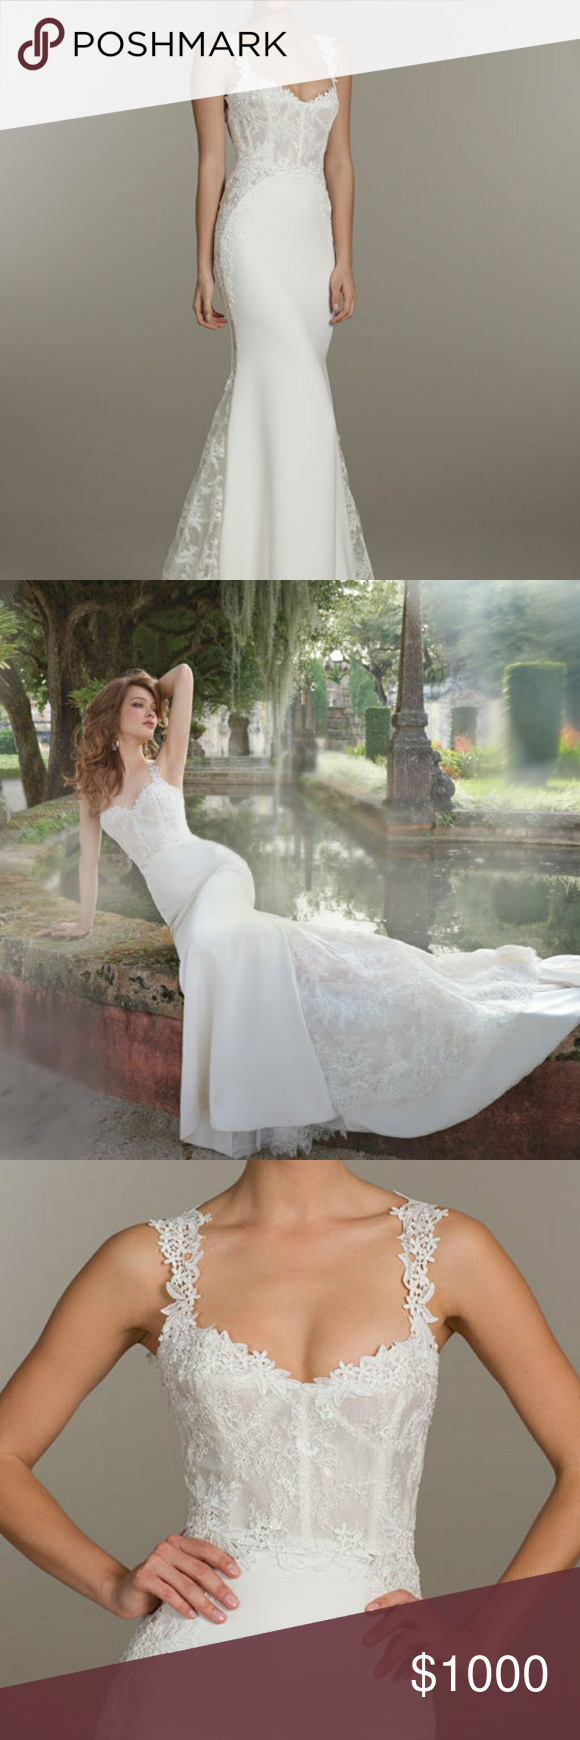 Wedding dress nwt wedding dress customer support and wedding